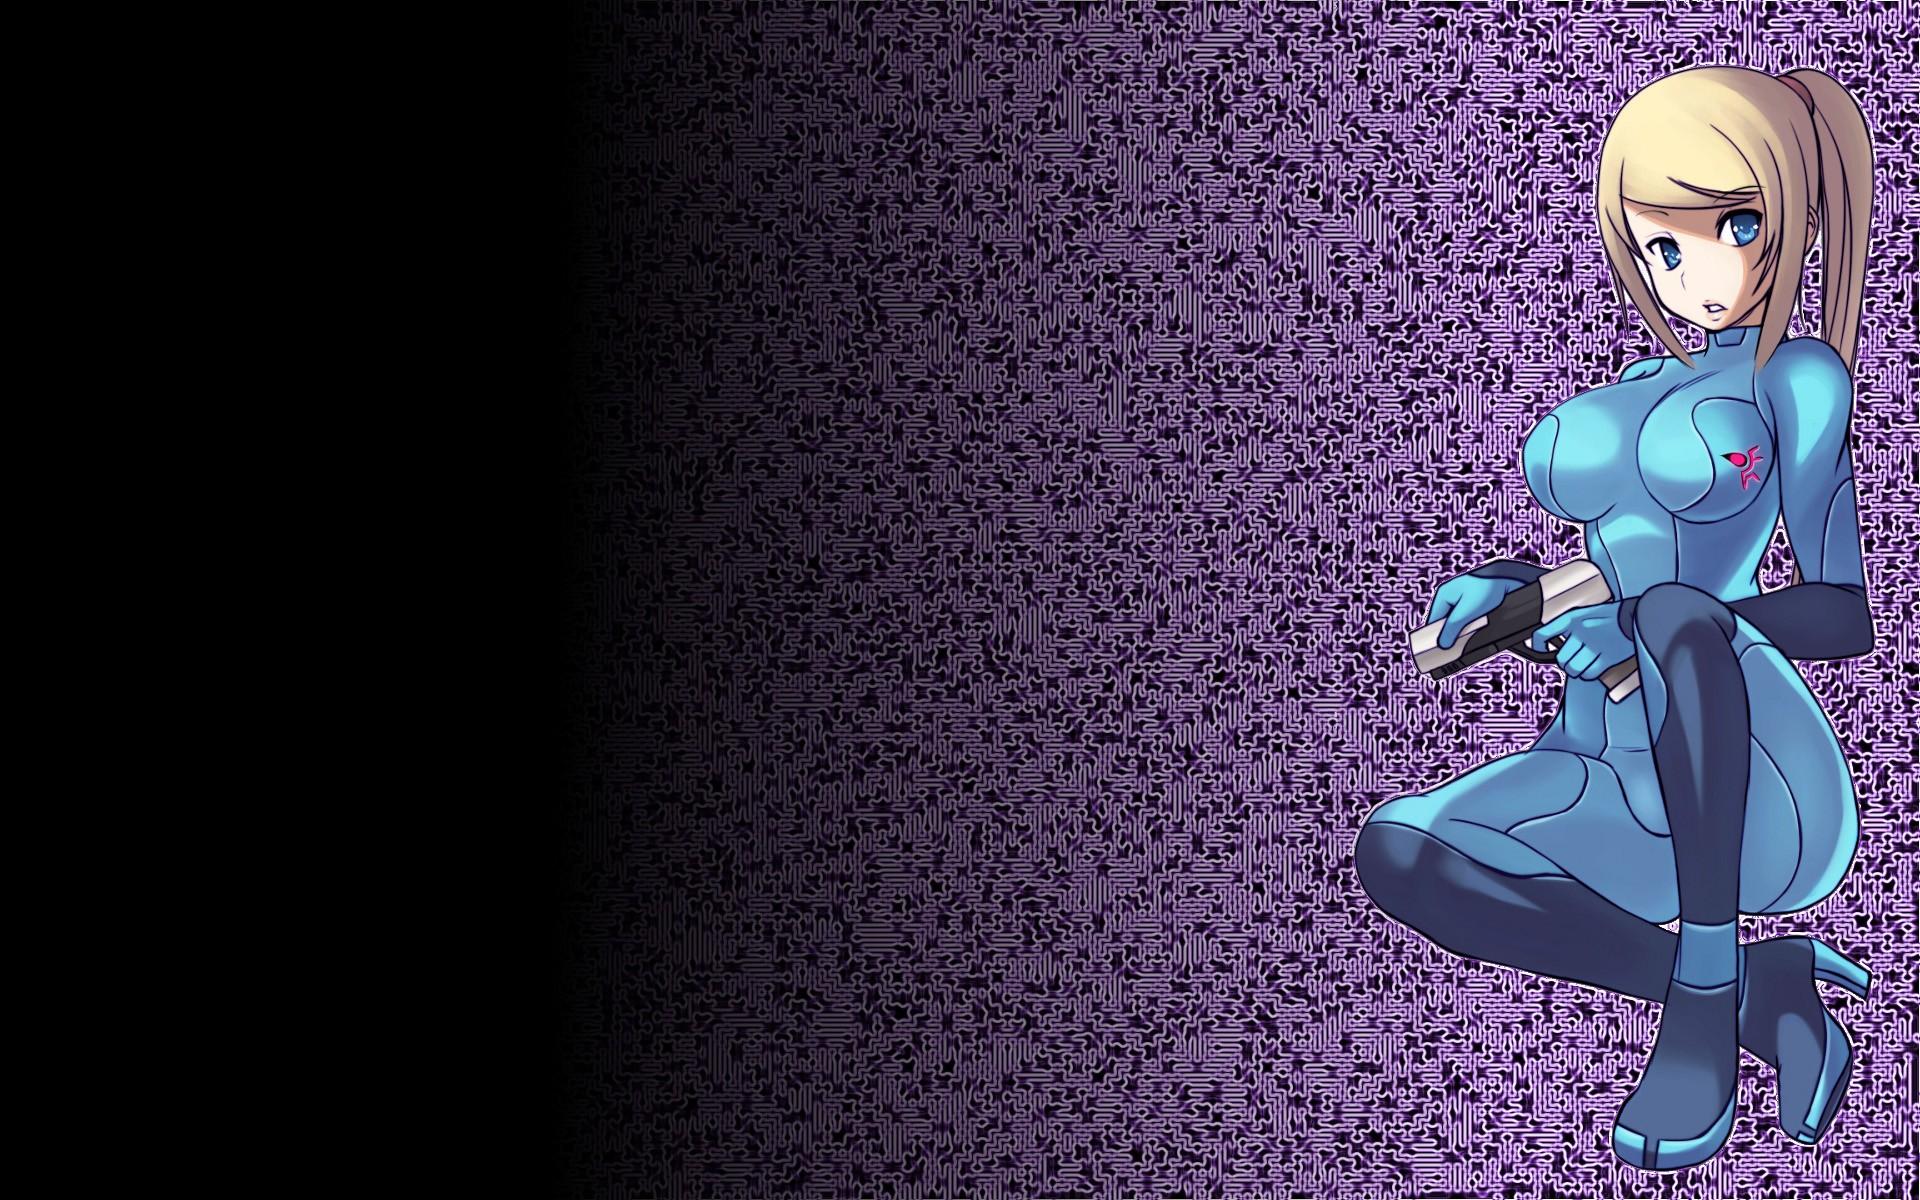 Zero Suit Samus Wallpaper Download Free Amazing Hd Wallpapers